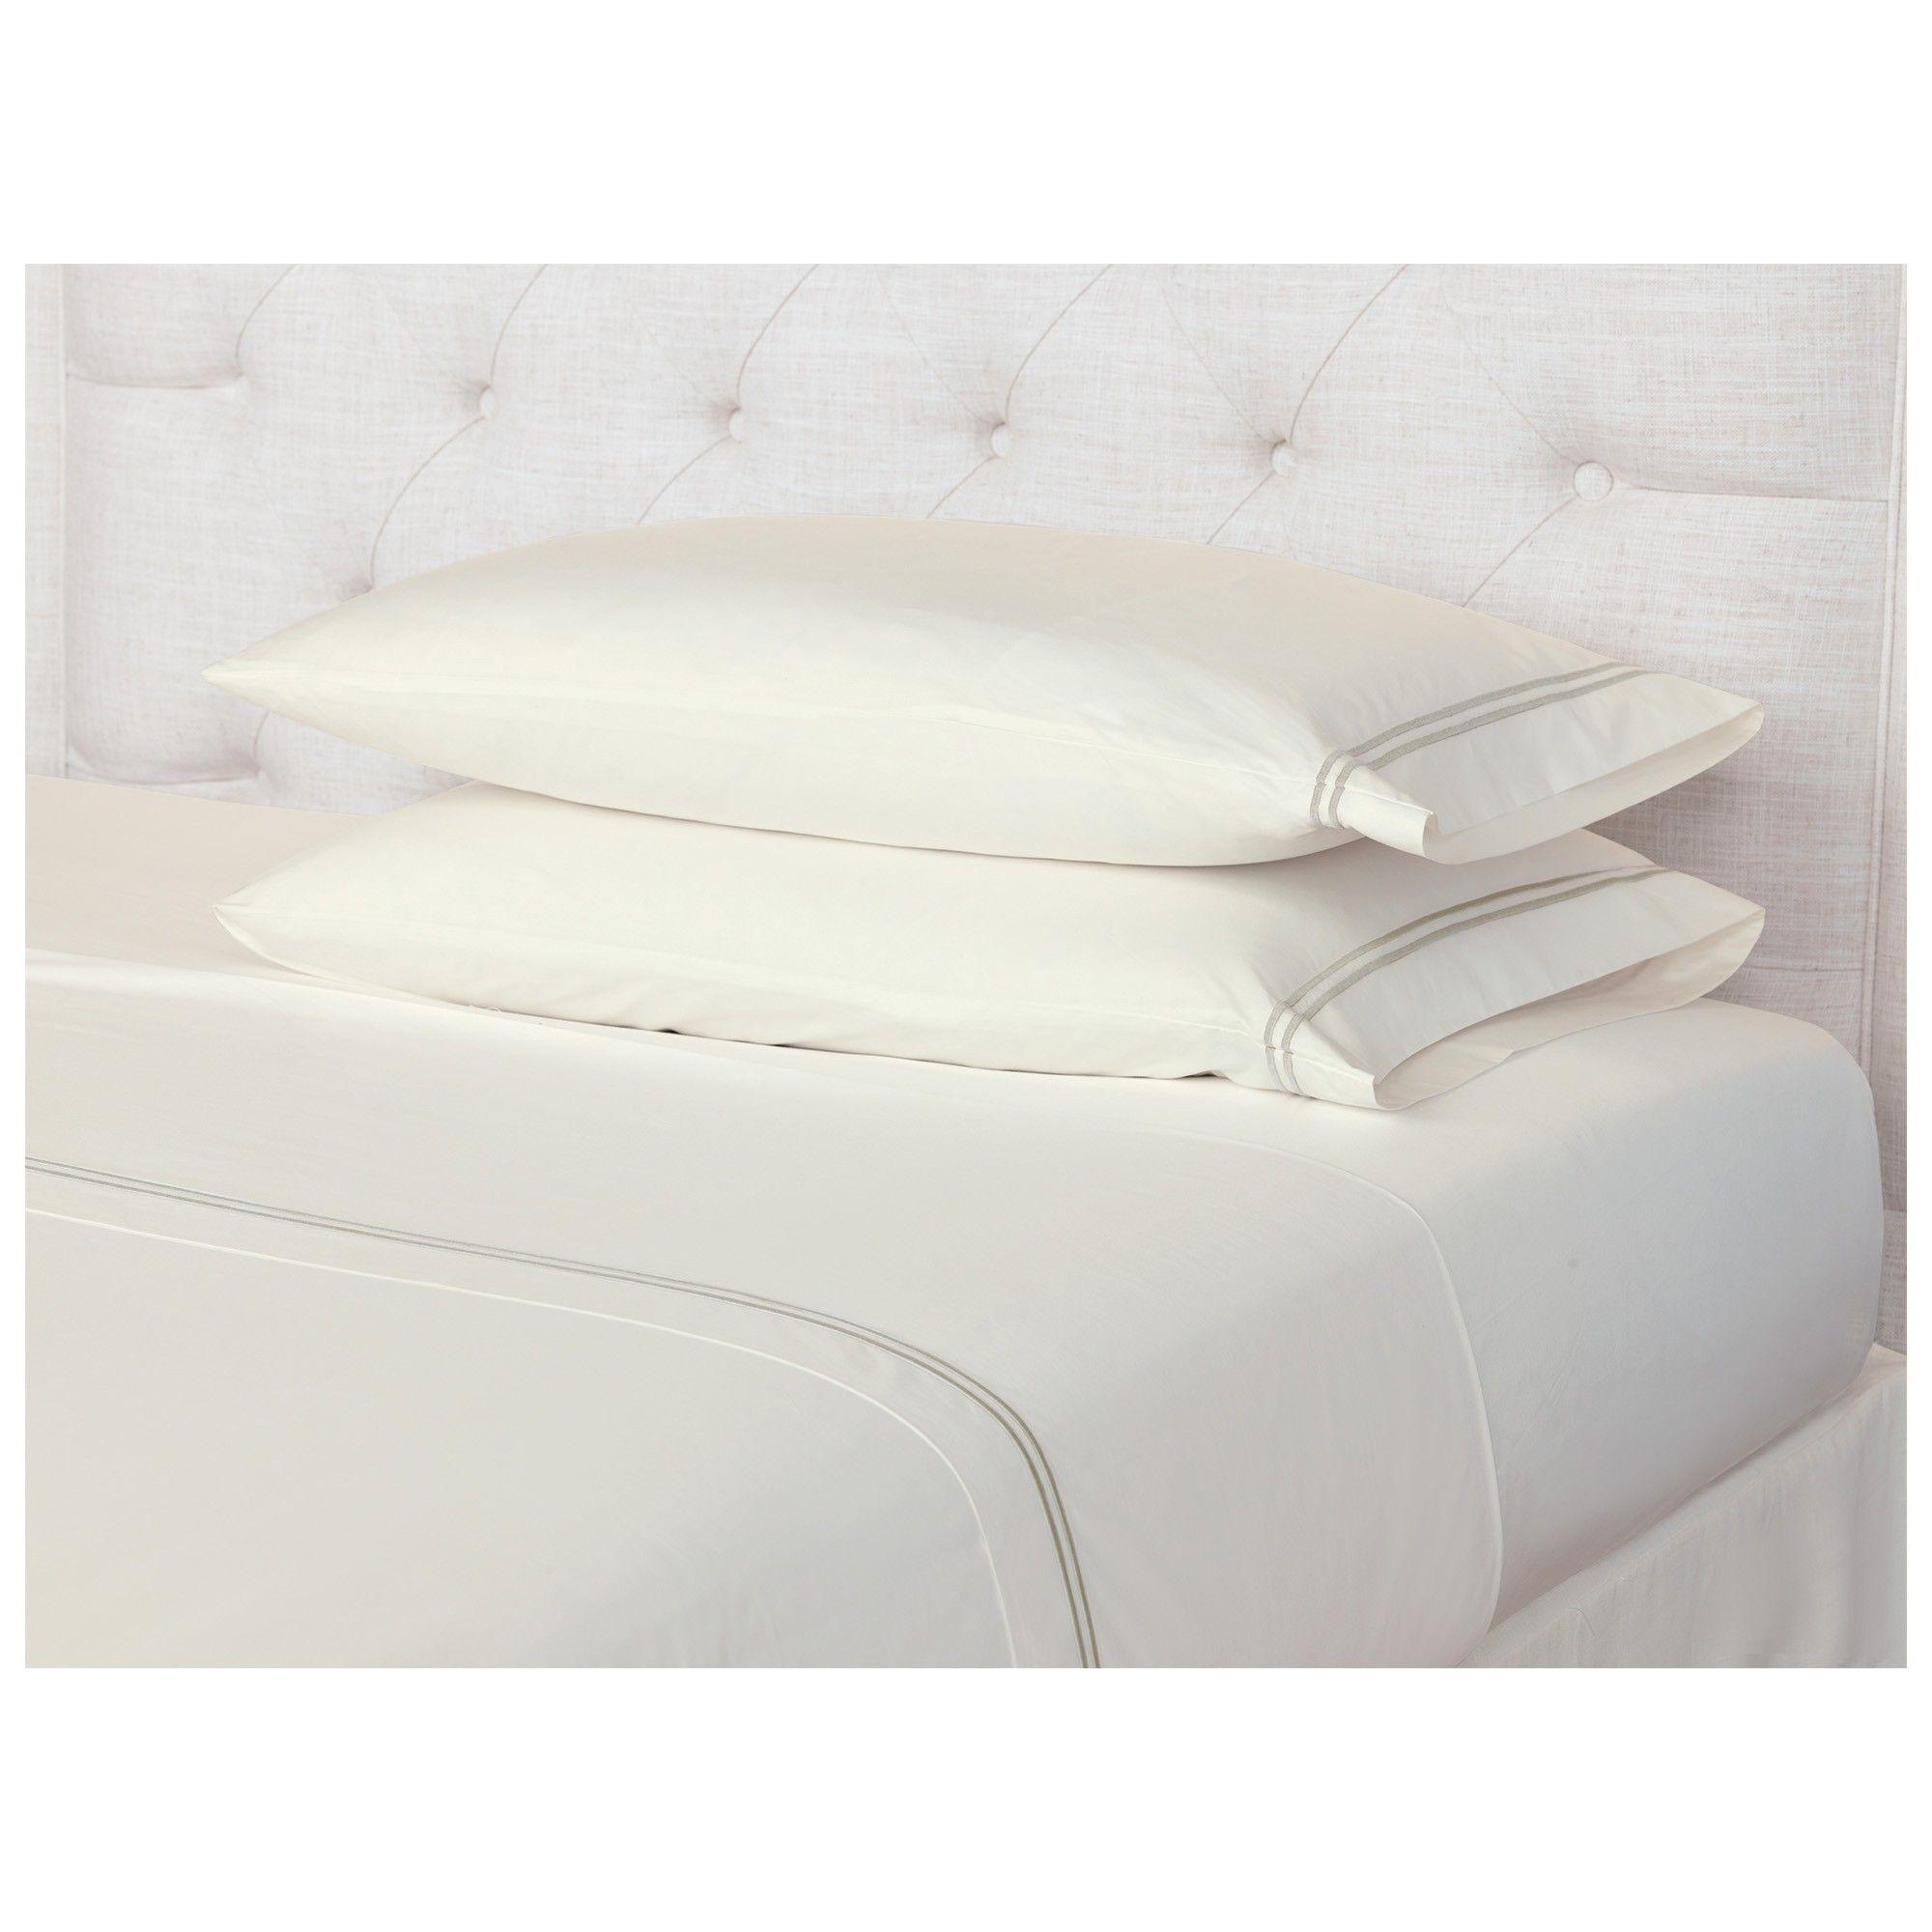 Caserta sheet set ivory bed u bath products curated kravet